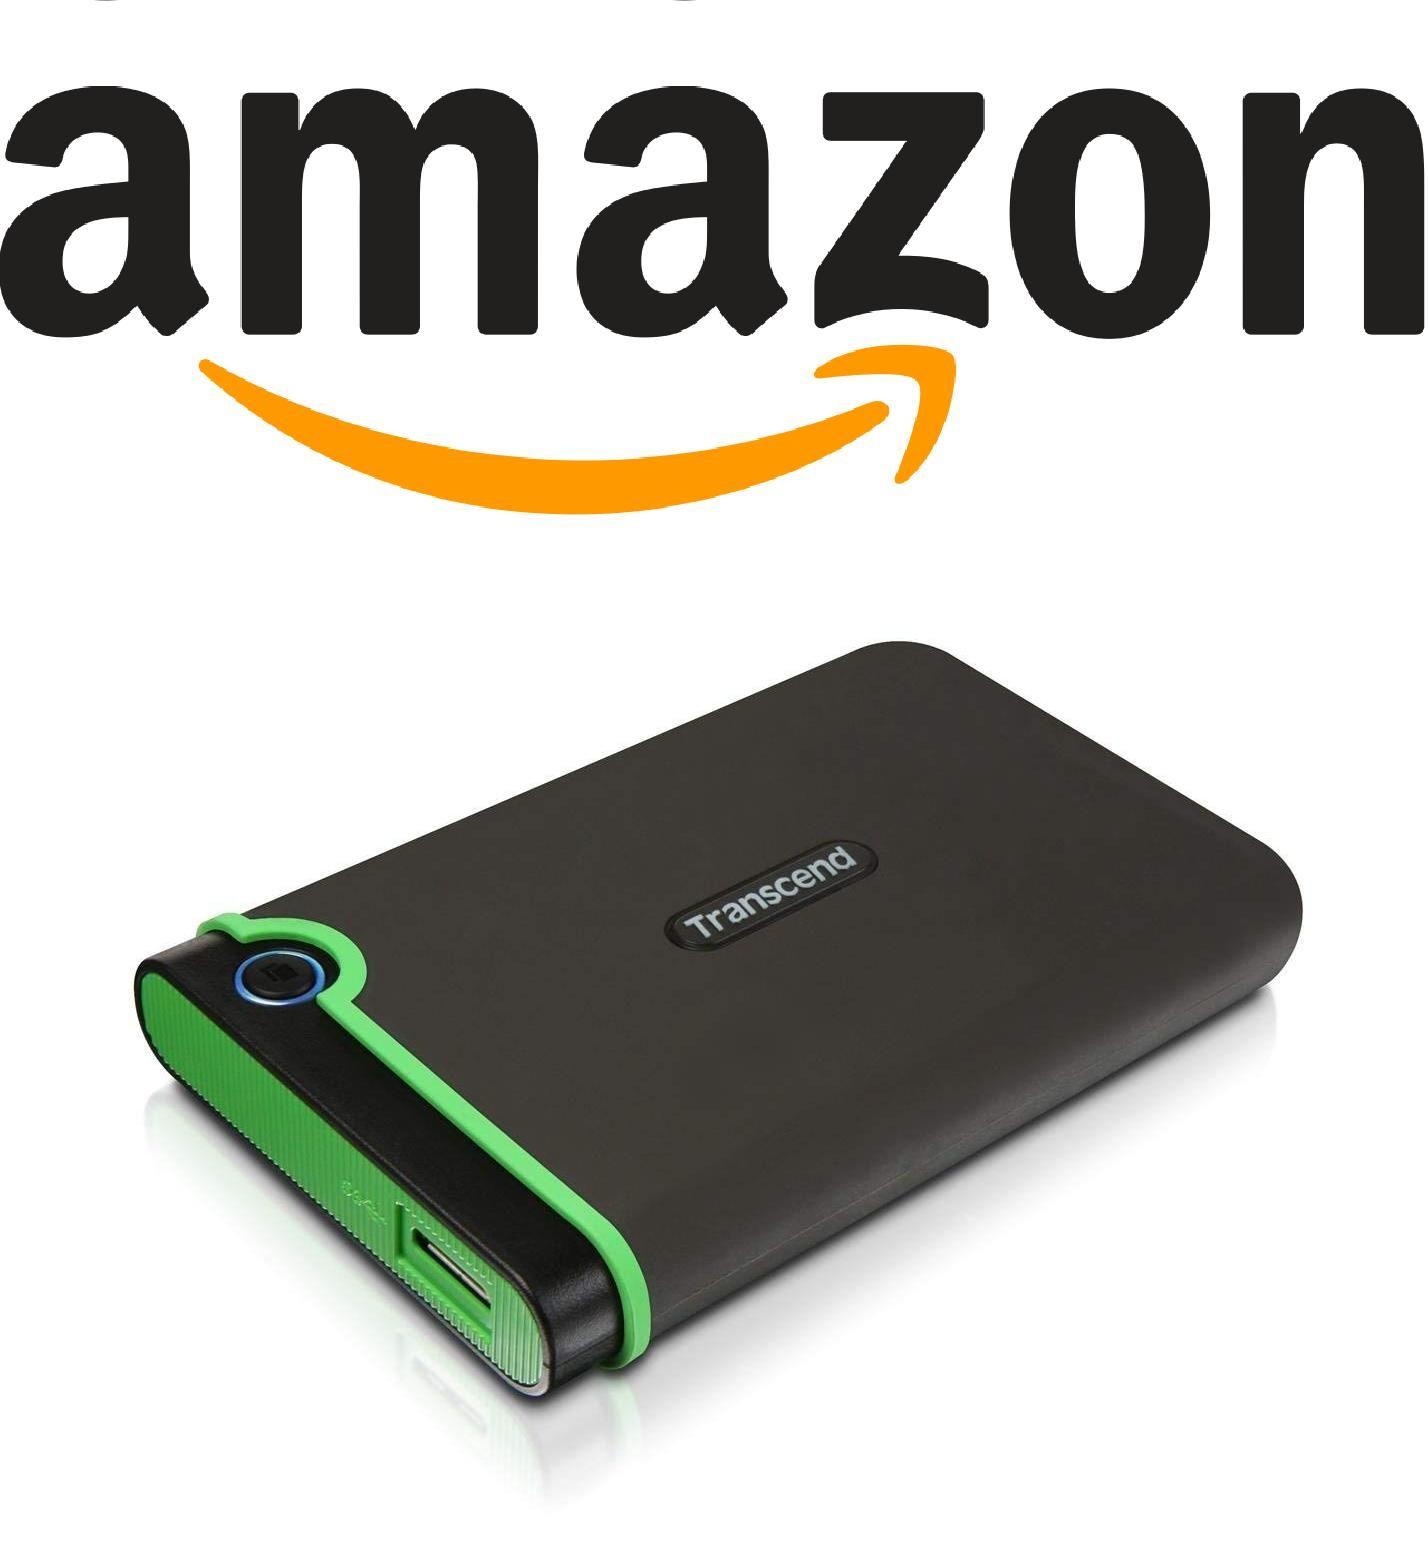 Transcend 1TB 2.5 inch USB 3.0 MilitaryGrade Shock